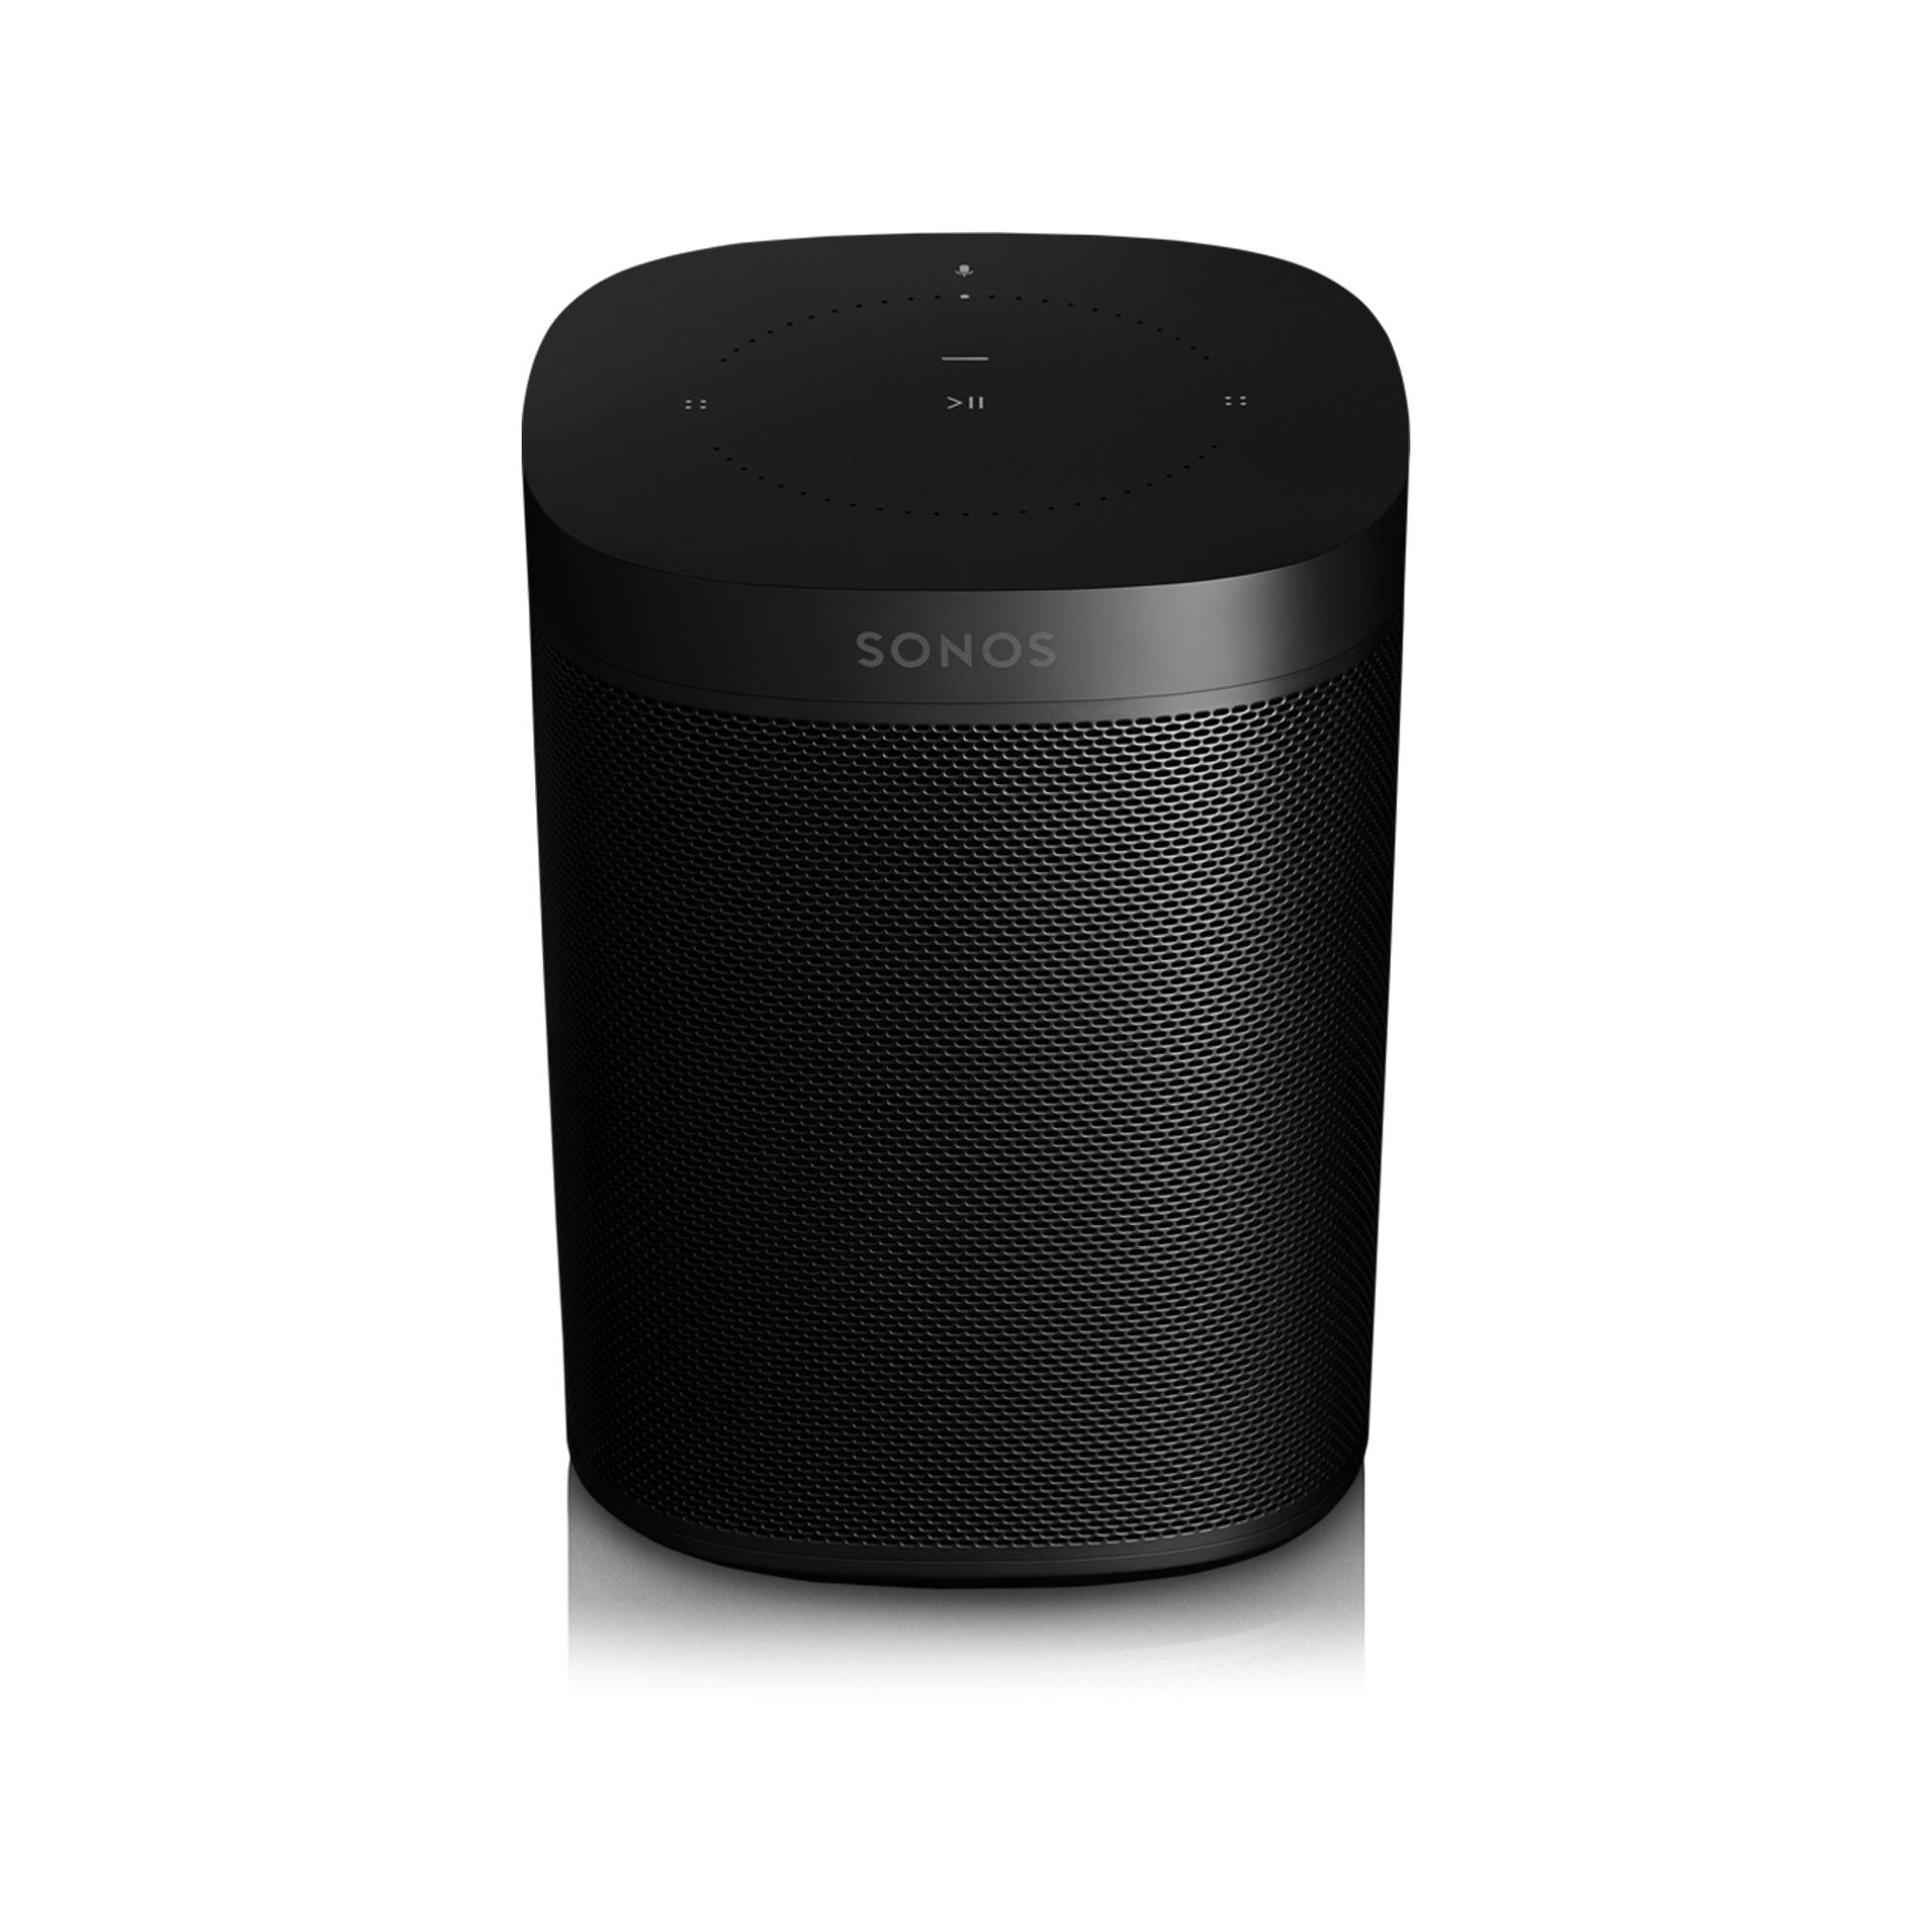 Sonos One Gen 2 Smart Speaker - Black